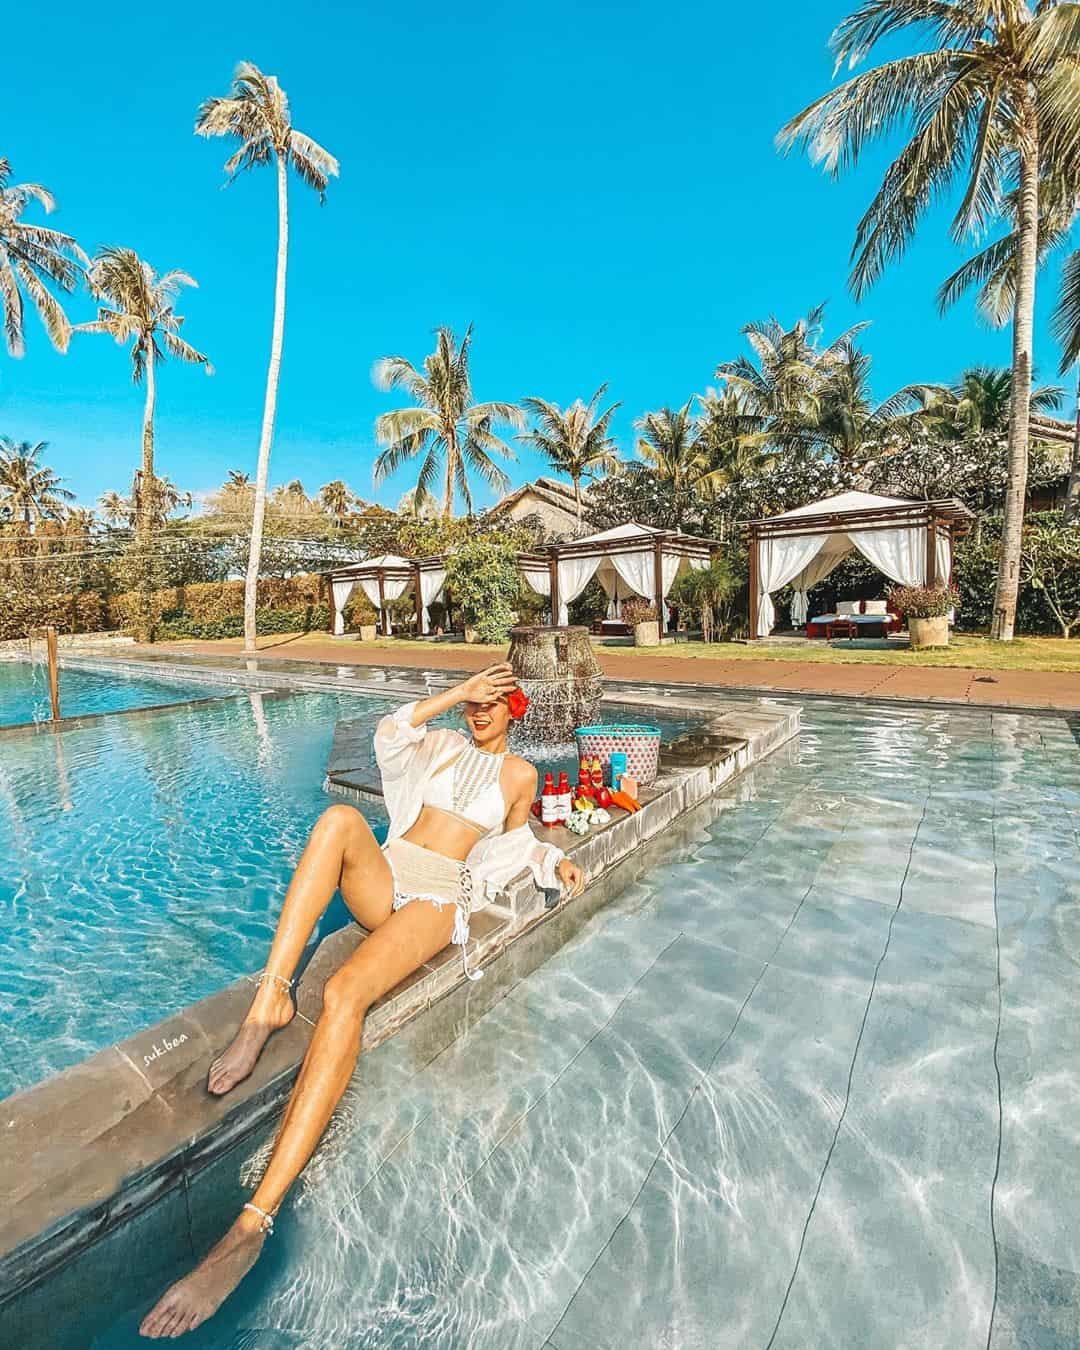 Hồ bơi ngoài trời của Aroma Resort. Hình: Instagram @suk.bea